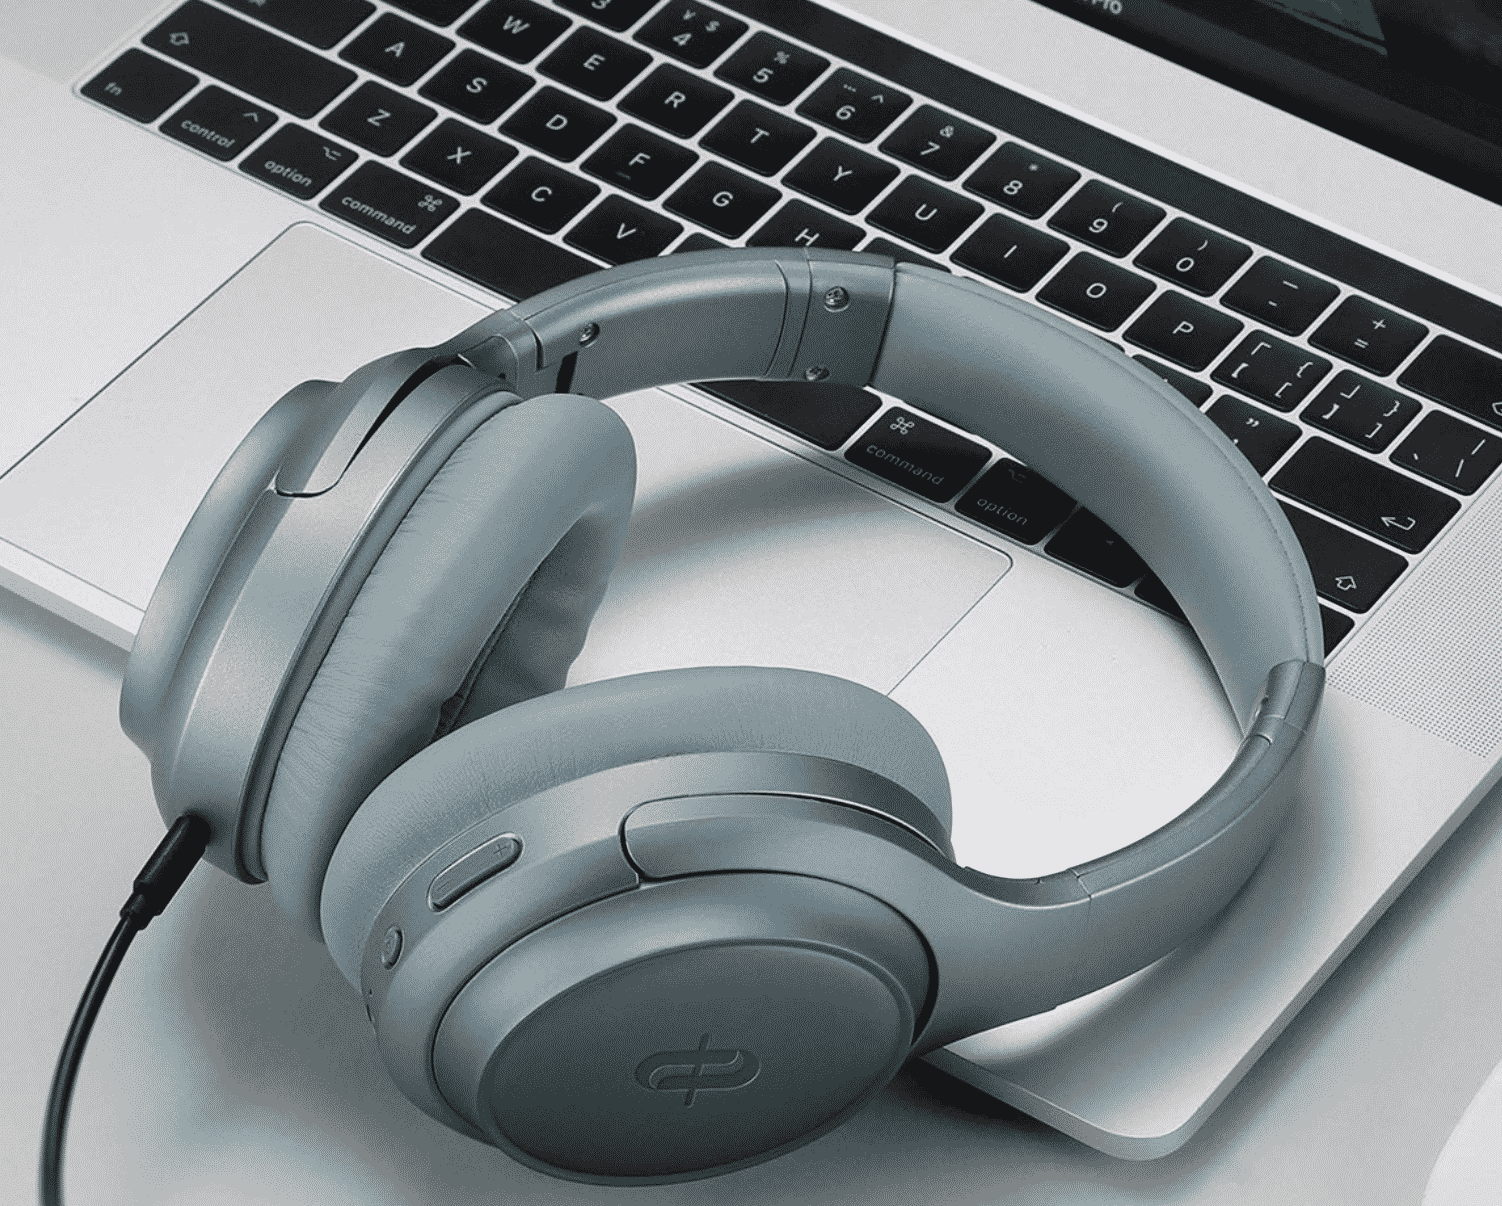 Taotronics noise cancelling headphones SoundSurge 60